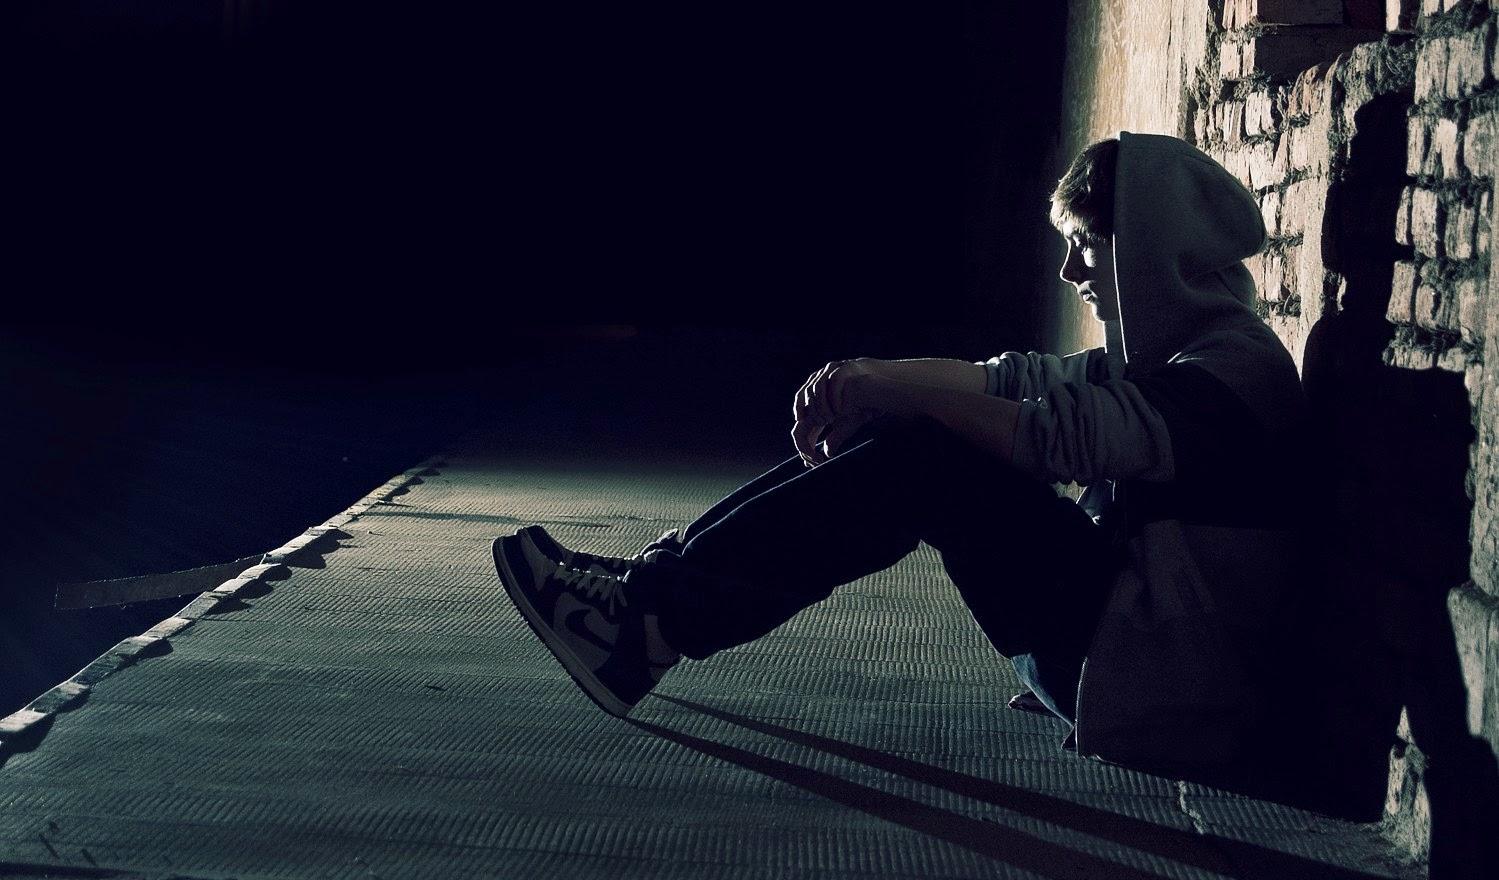 Sad alone boy wallpaper 1 786406jpg 1499x880